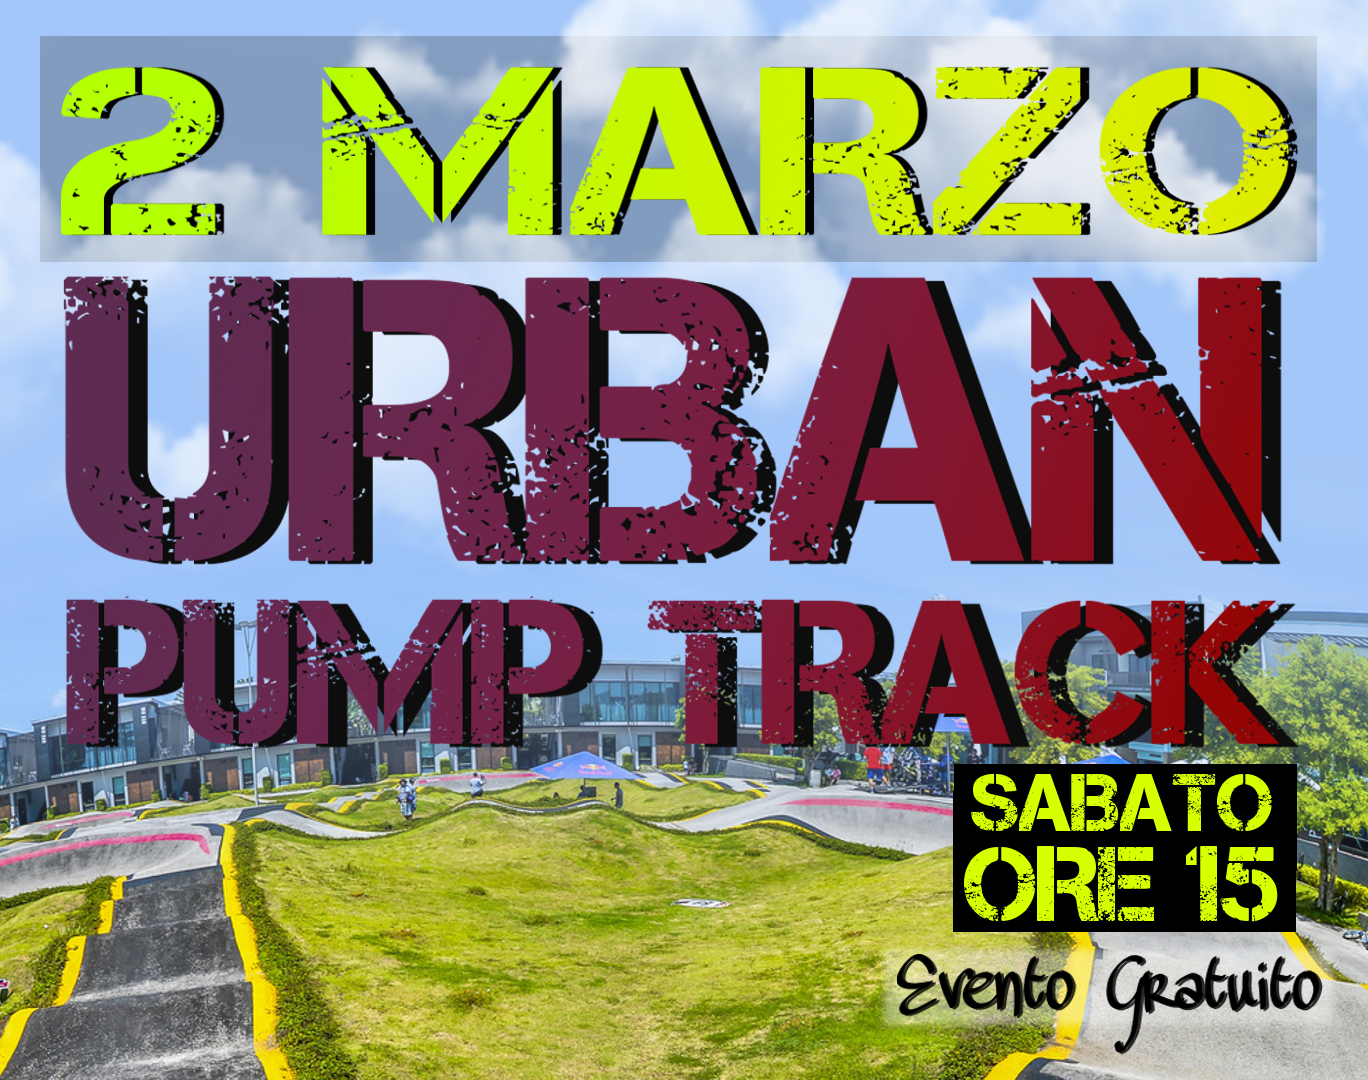 URBAN-PUMP-TRACK3-palagym-rivarolo